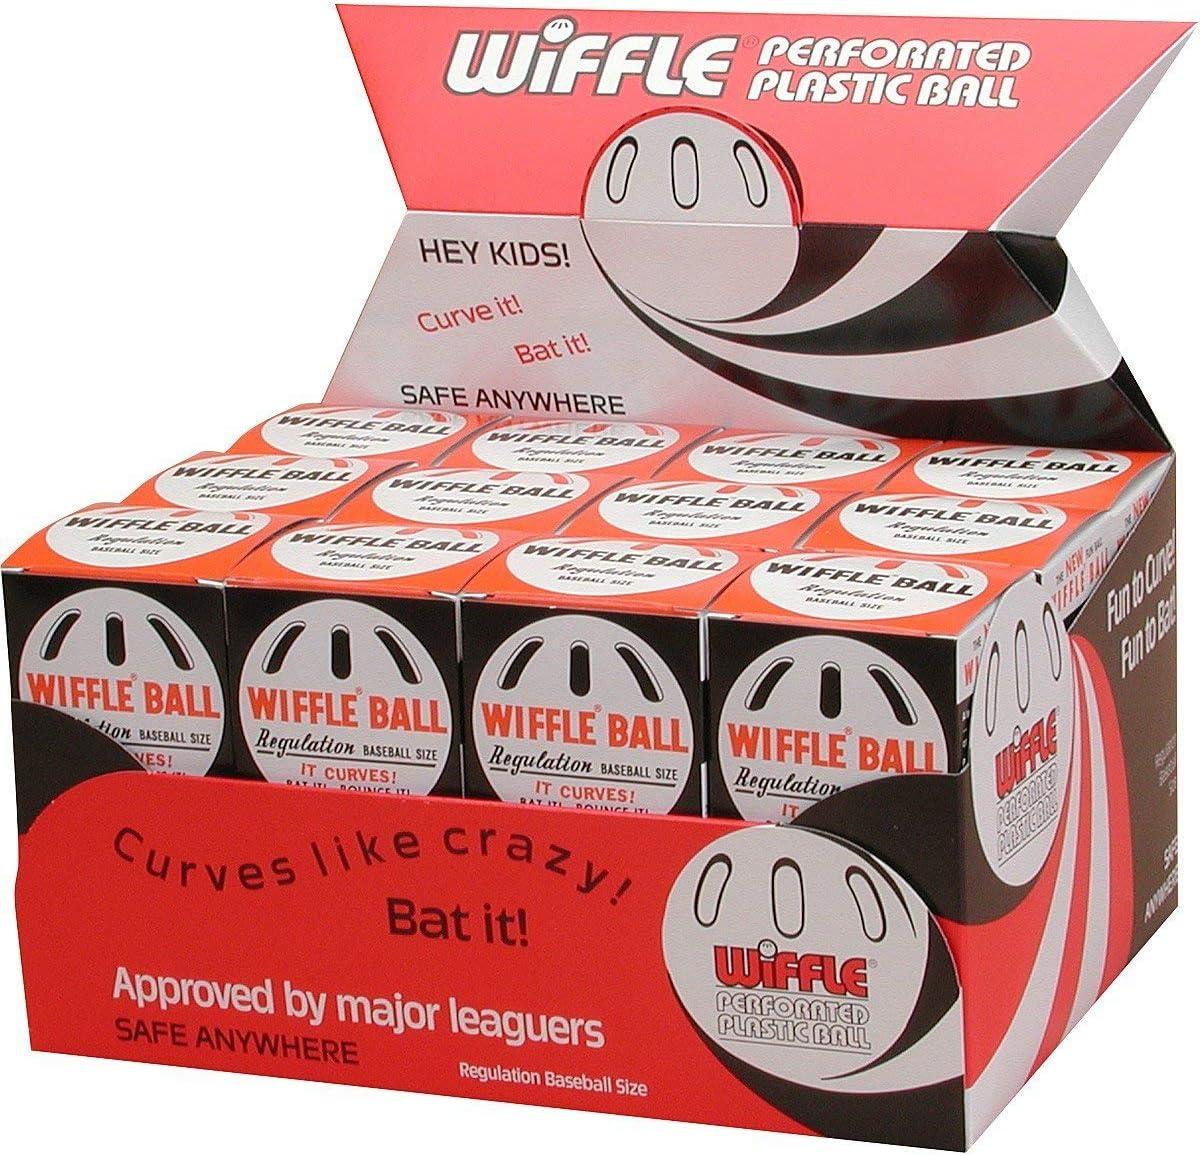 2 Packs of 3 Lot of 6 Wiffle Baseballs